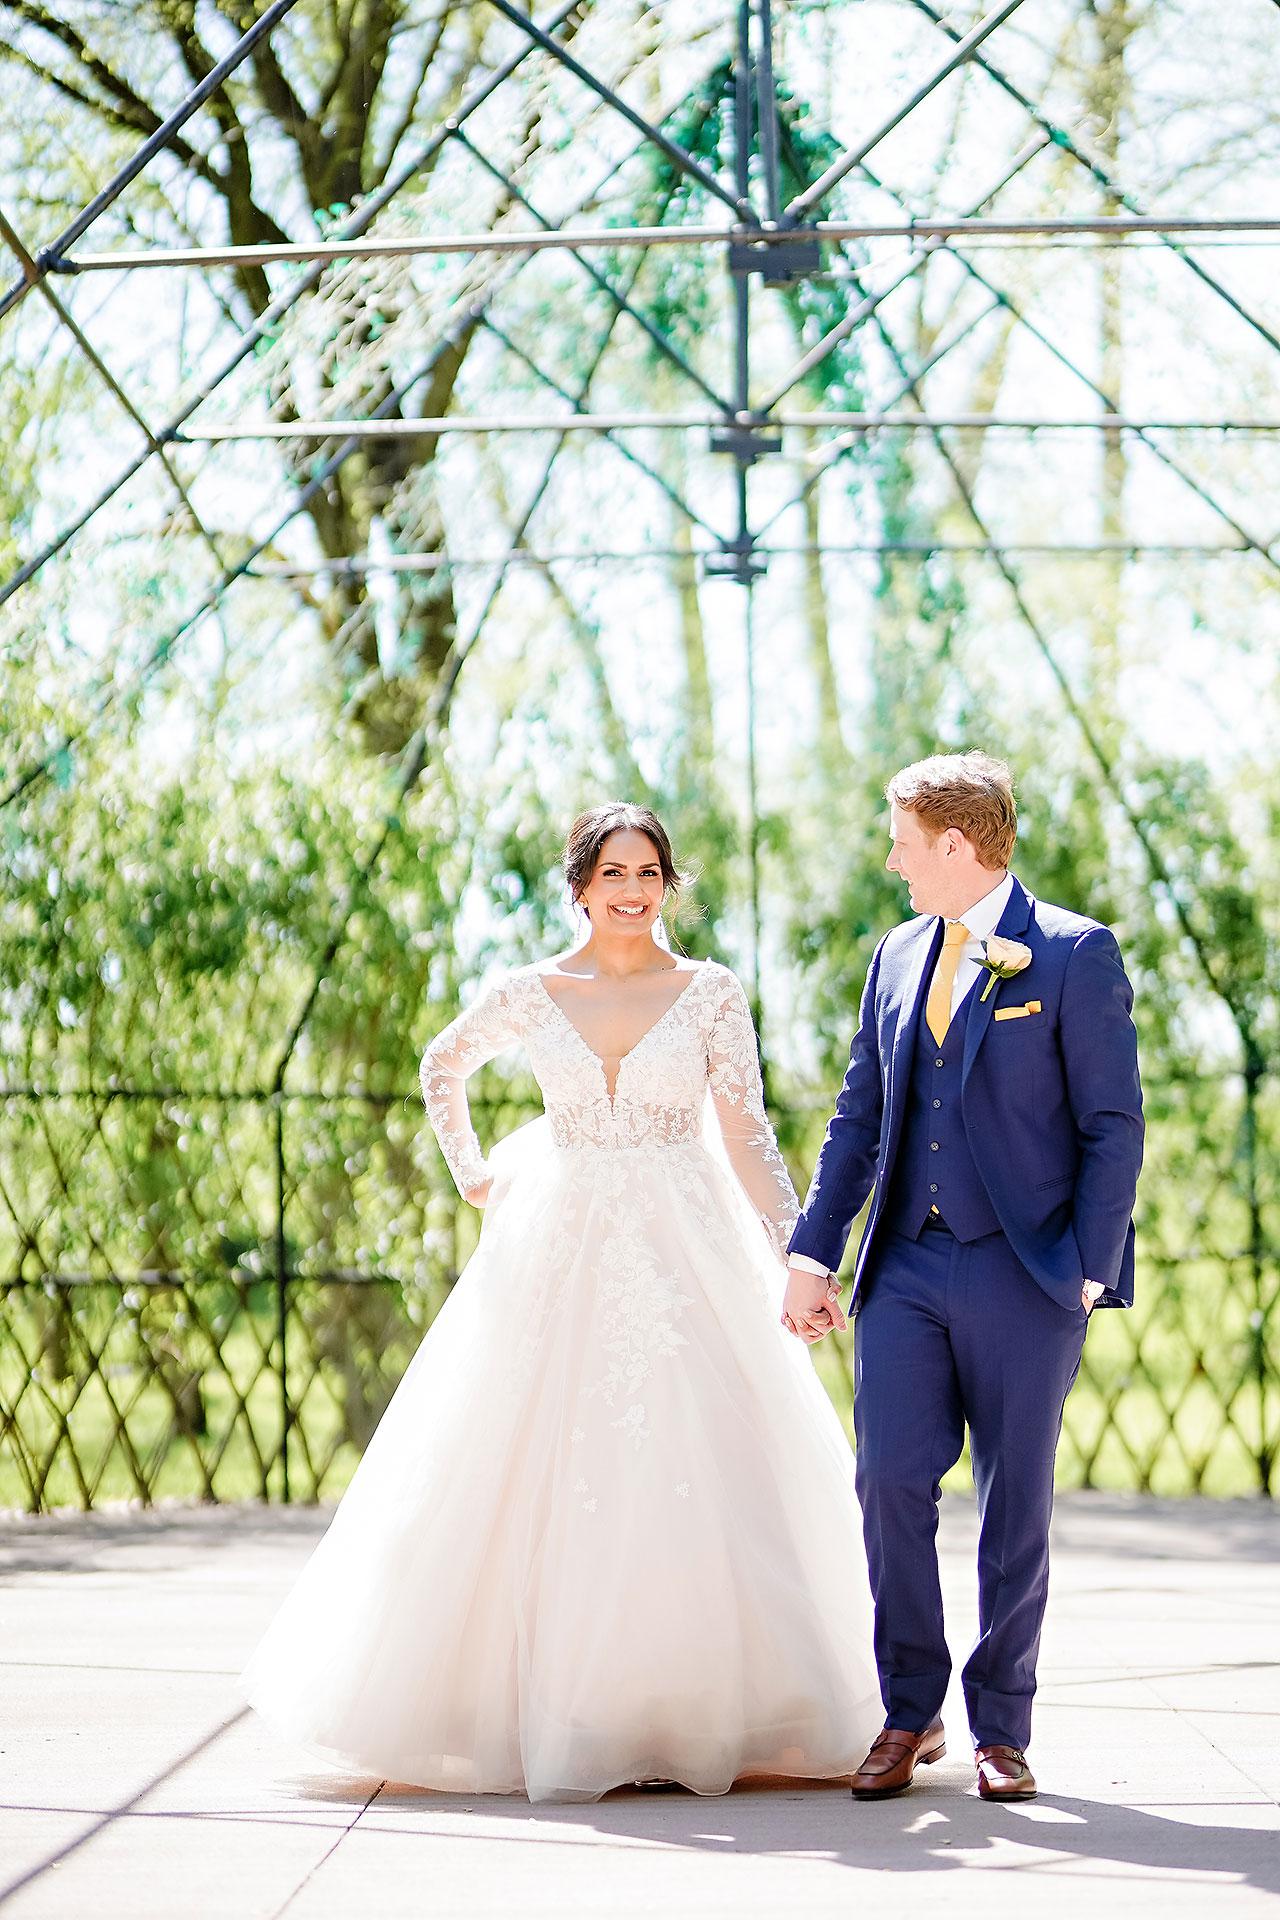 Nadia Parker Black Iris Estate Carmel Indiana Wedding May 2021 085